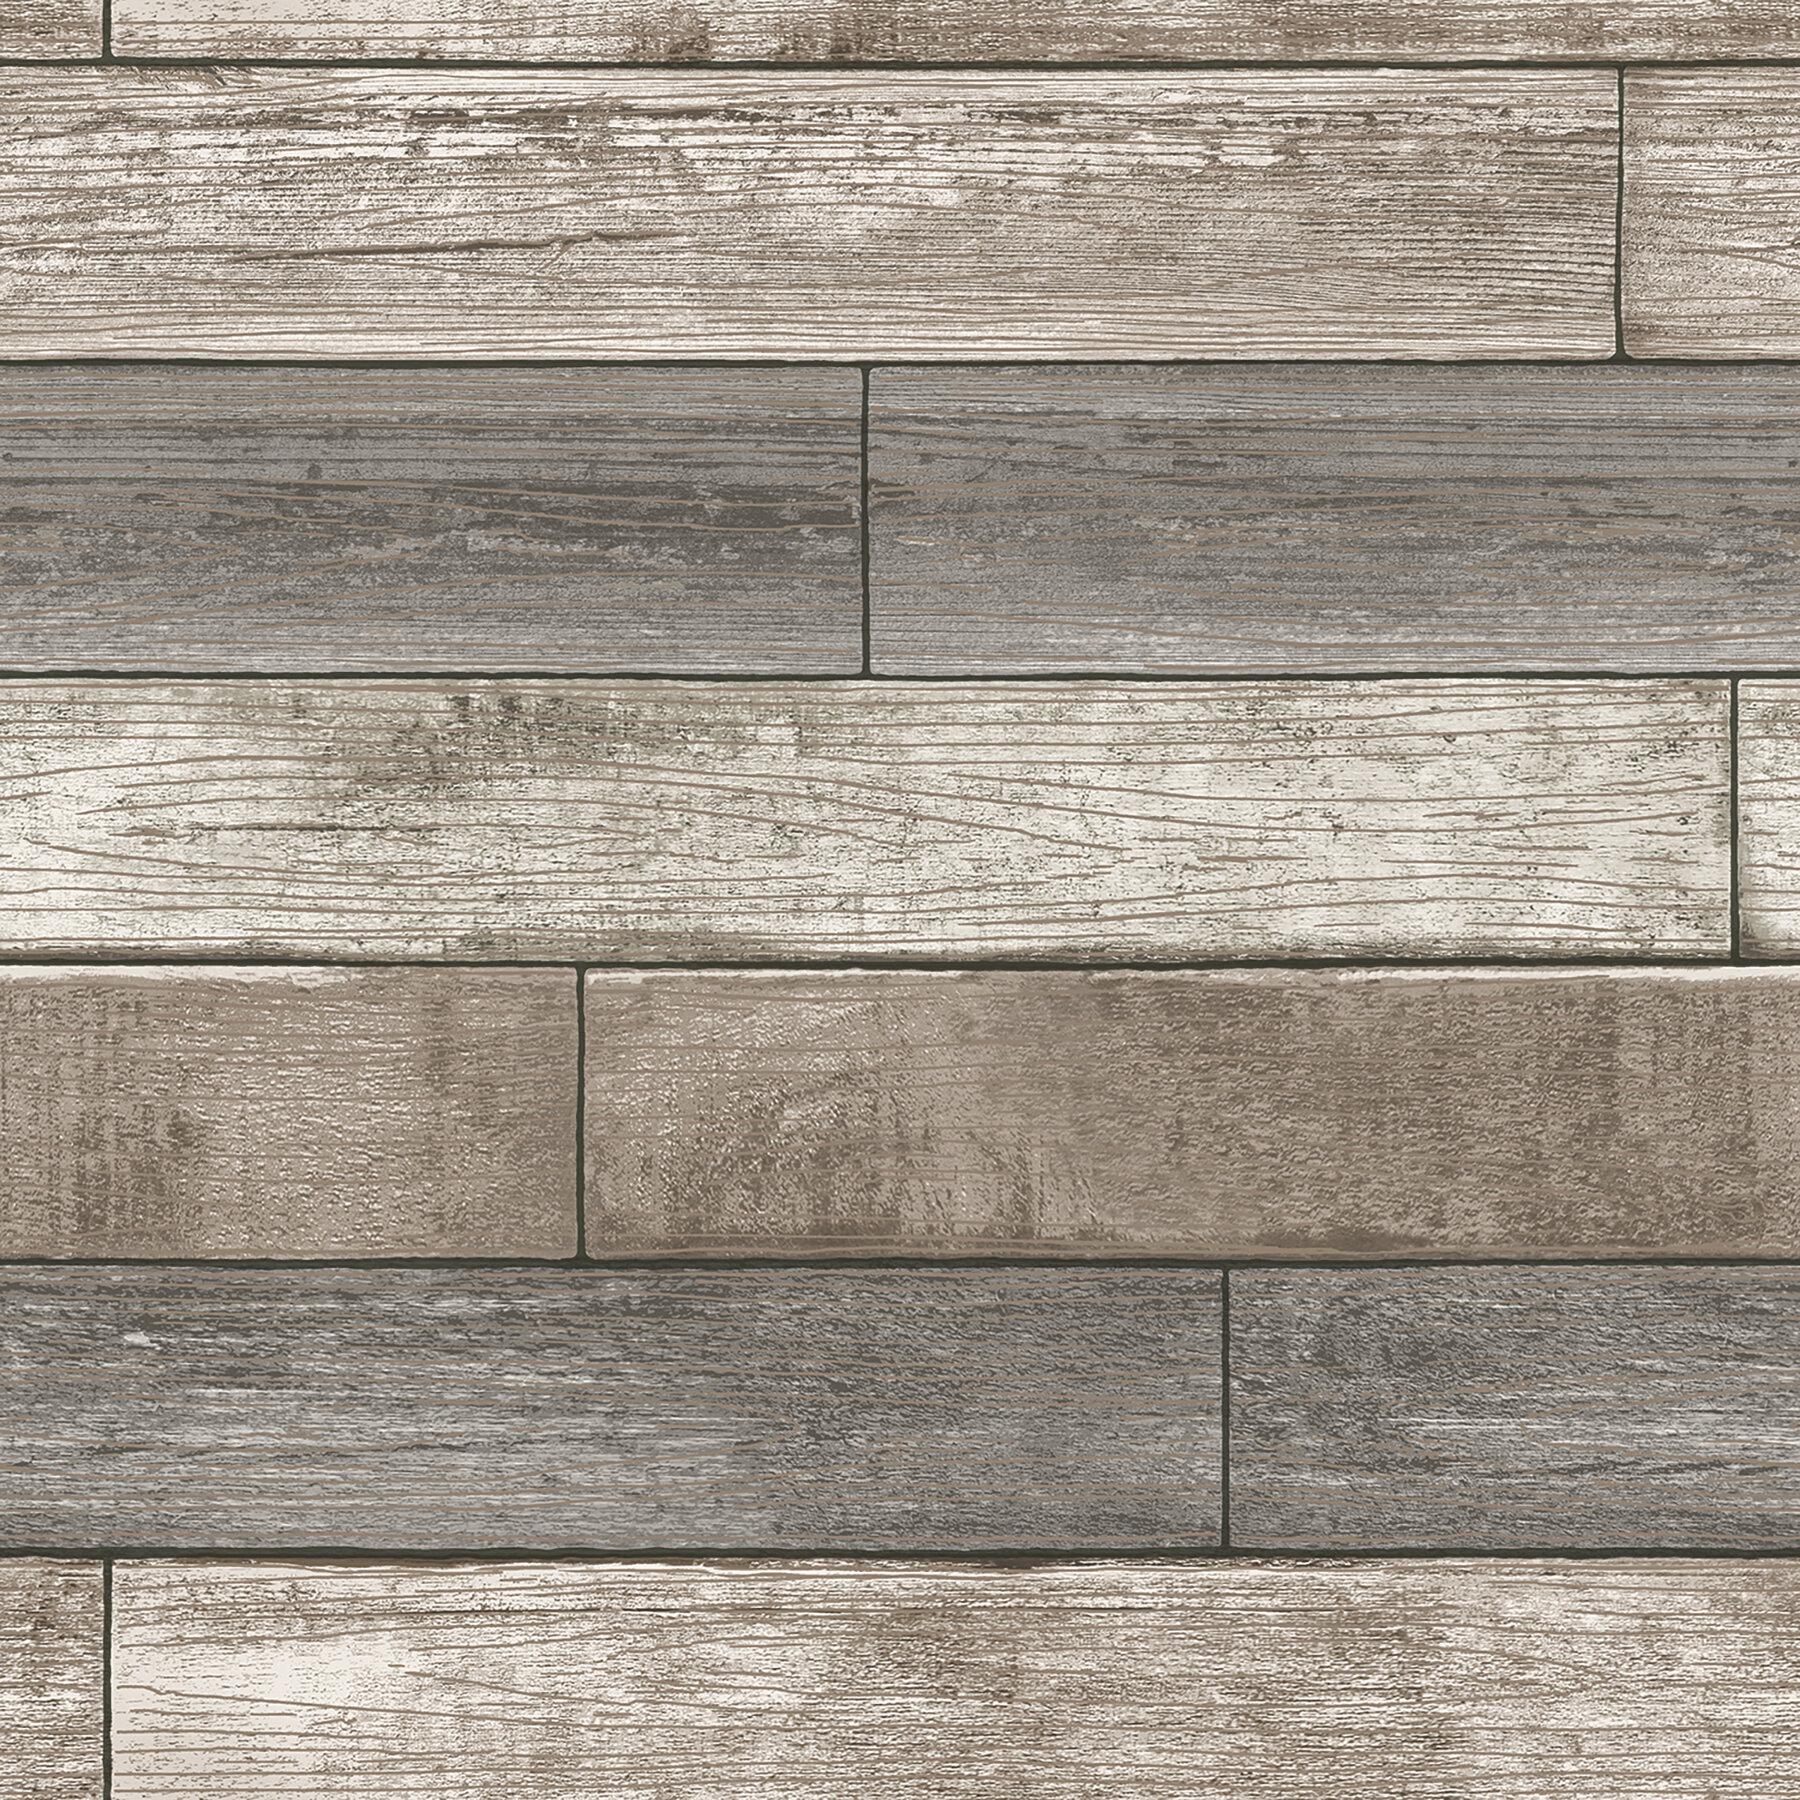 Nu 18 X 20 5 Reclaimed Wood Plank Wallpaper Roll Reviews Wayfair